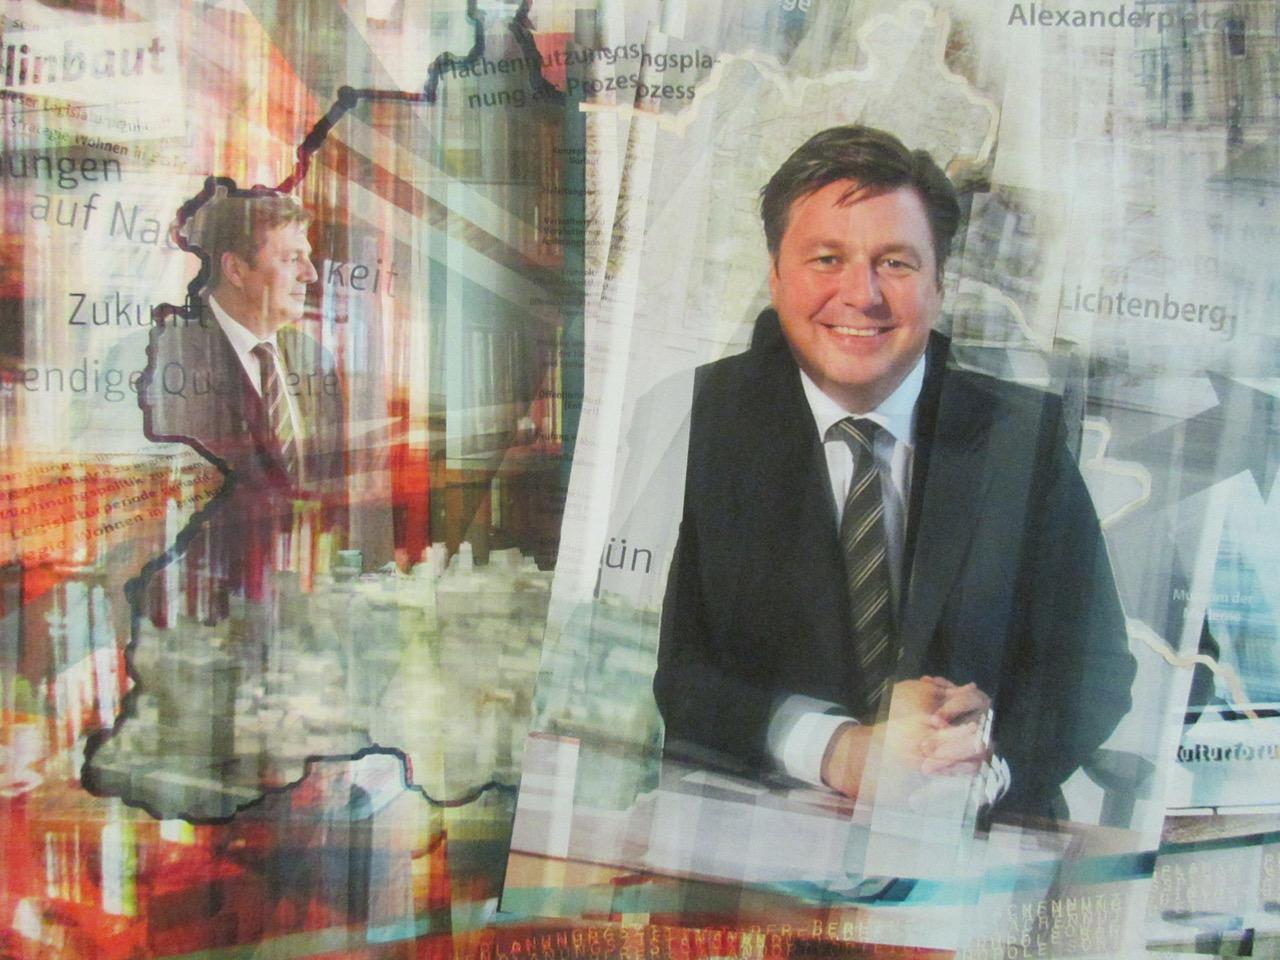 Maja Patas: Fotomontage von Andreas Geisel